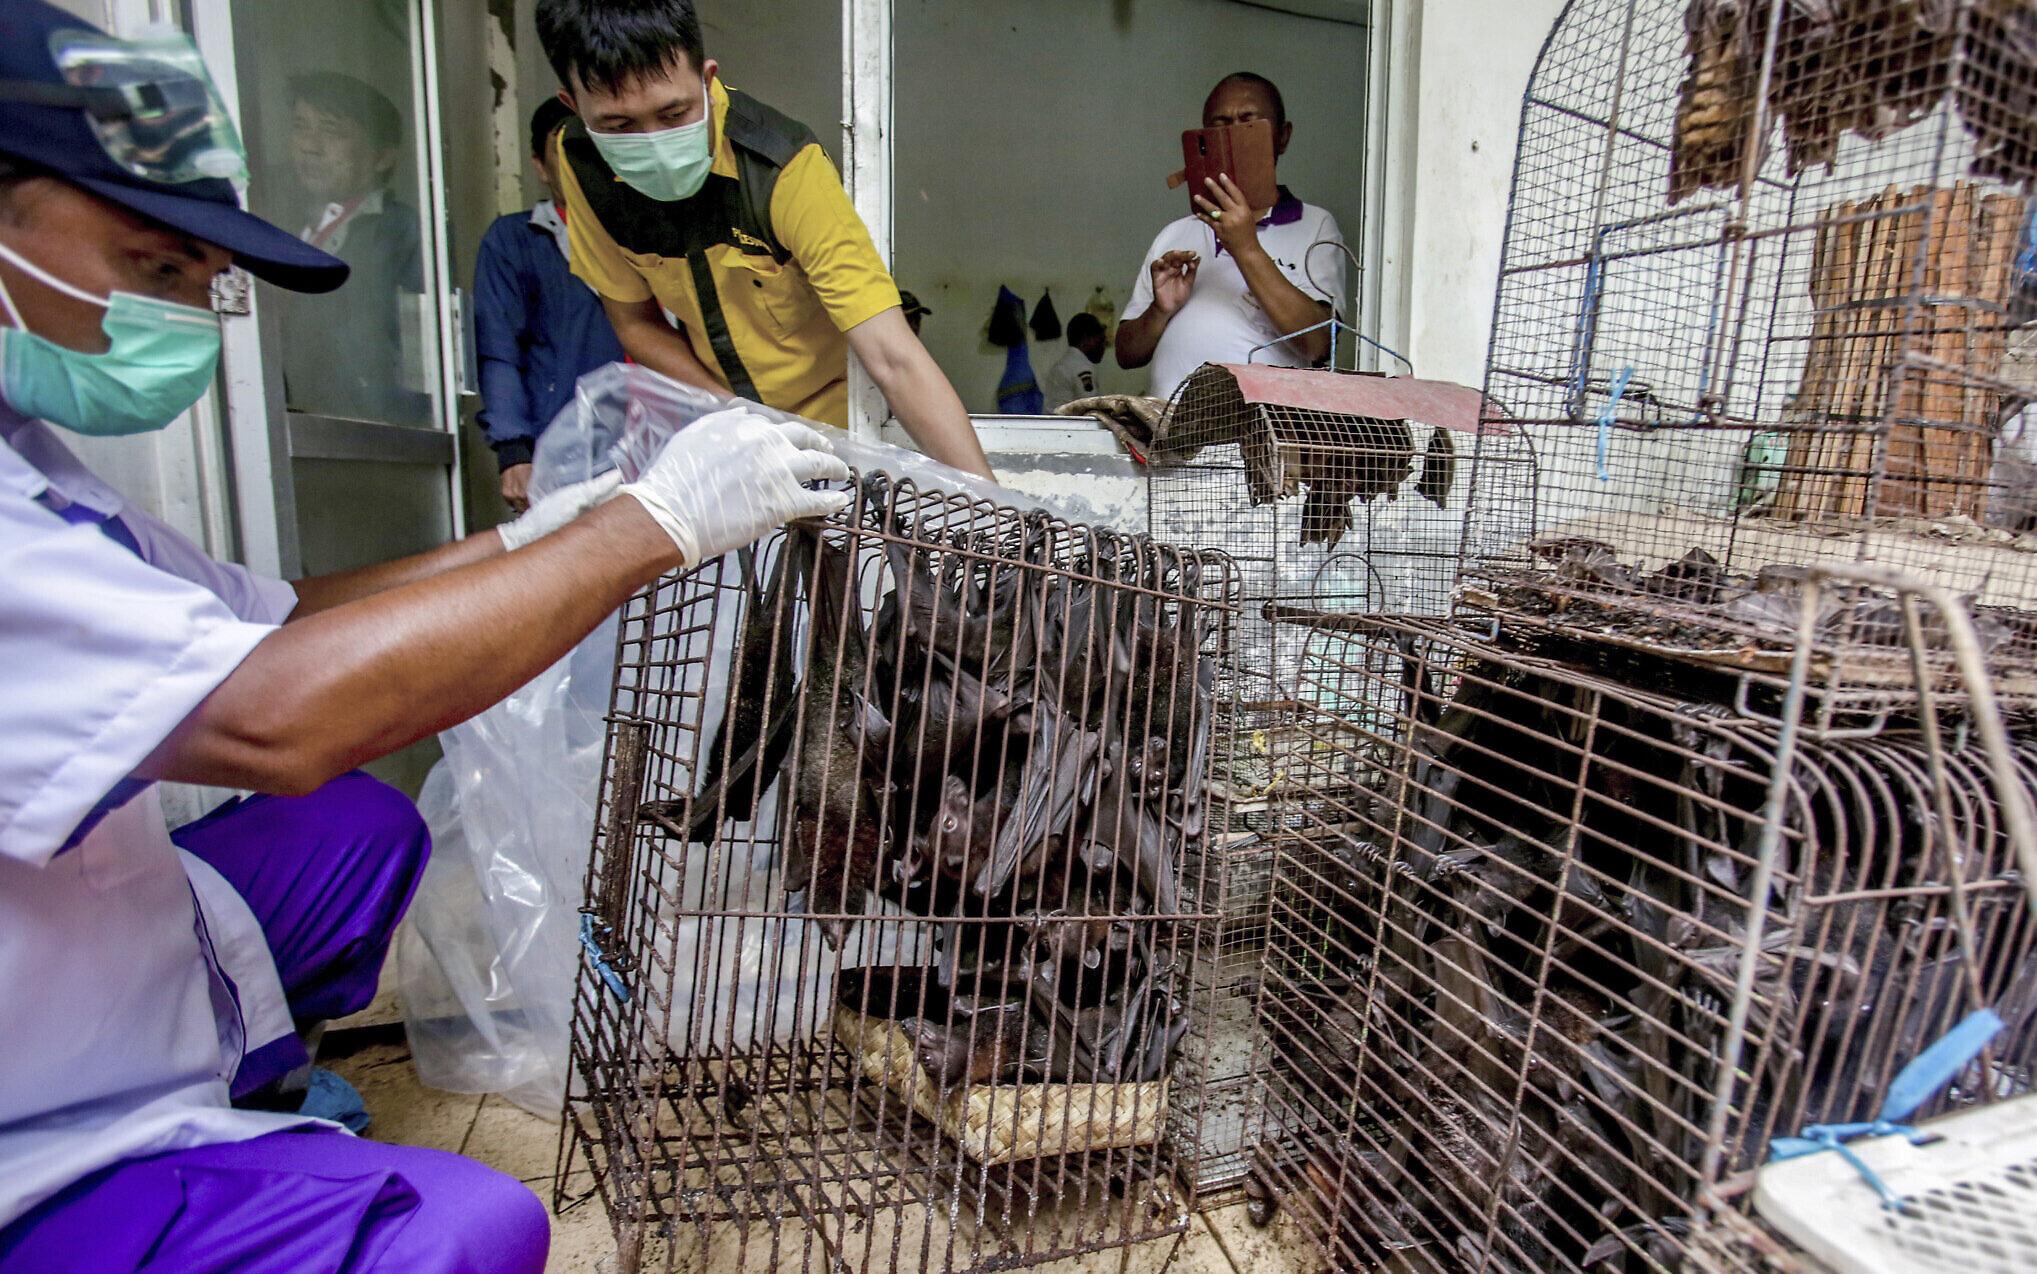 COVID-19 virus originates from nature, animal research underway — World Health Organization expert